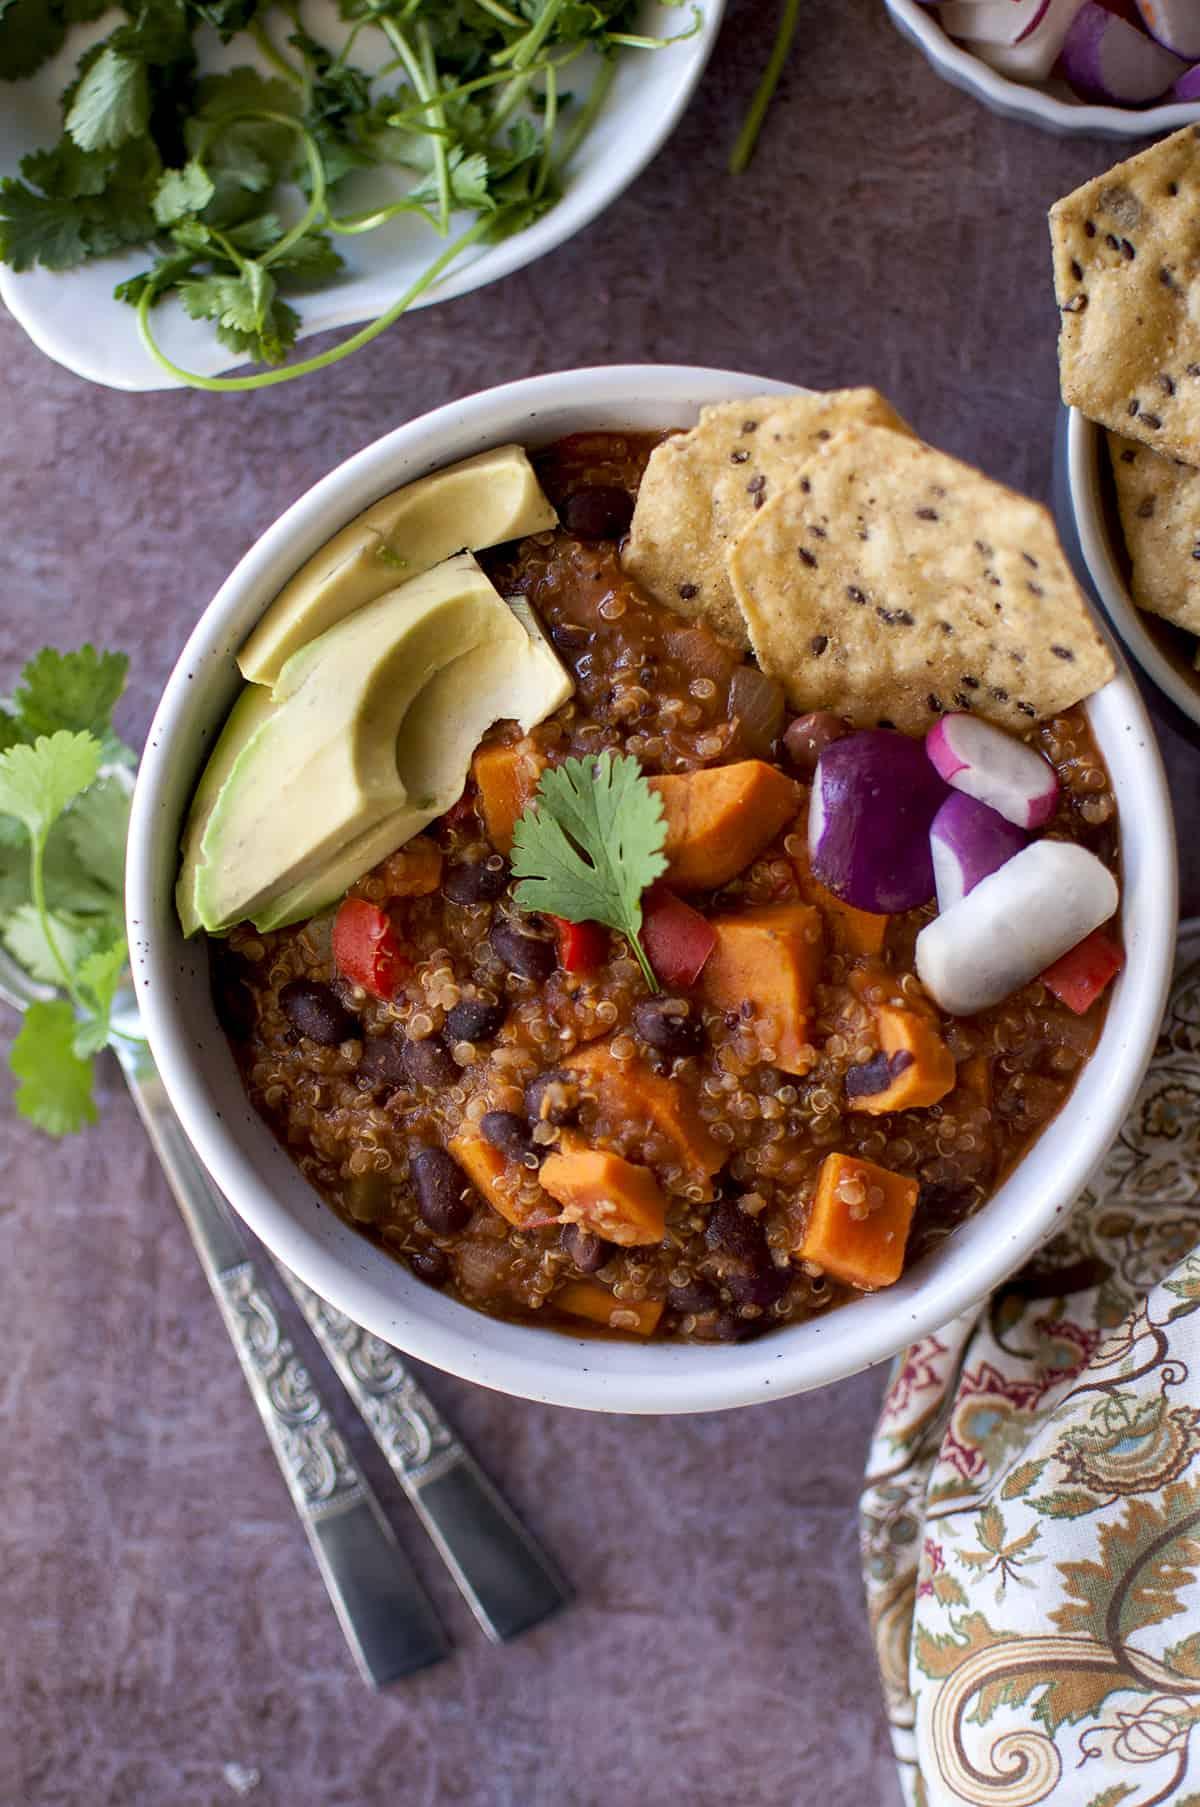 White bowl with the sweet potato quinoa chili topped with avocado, radish, cilantro and chips